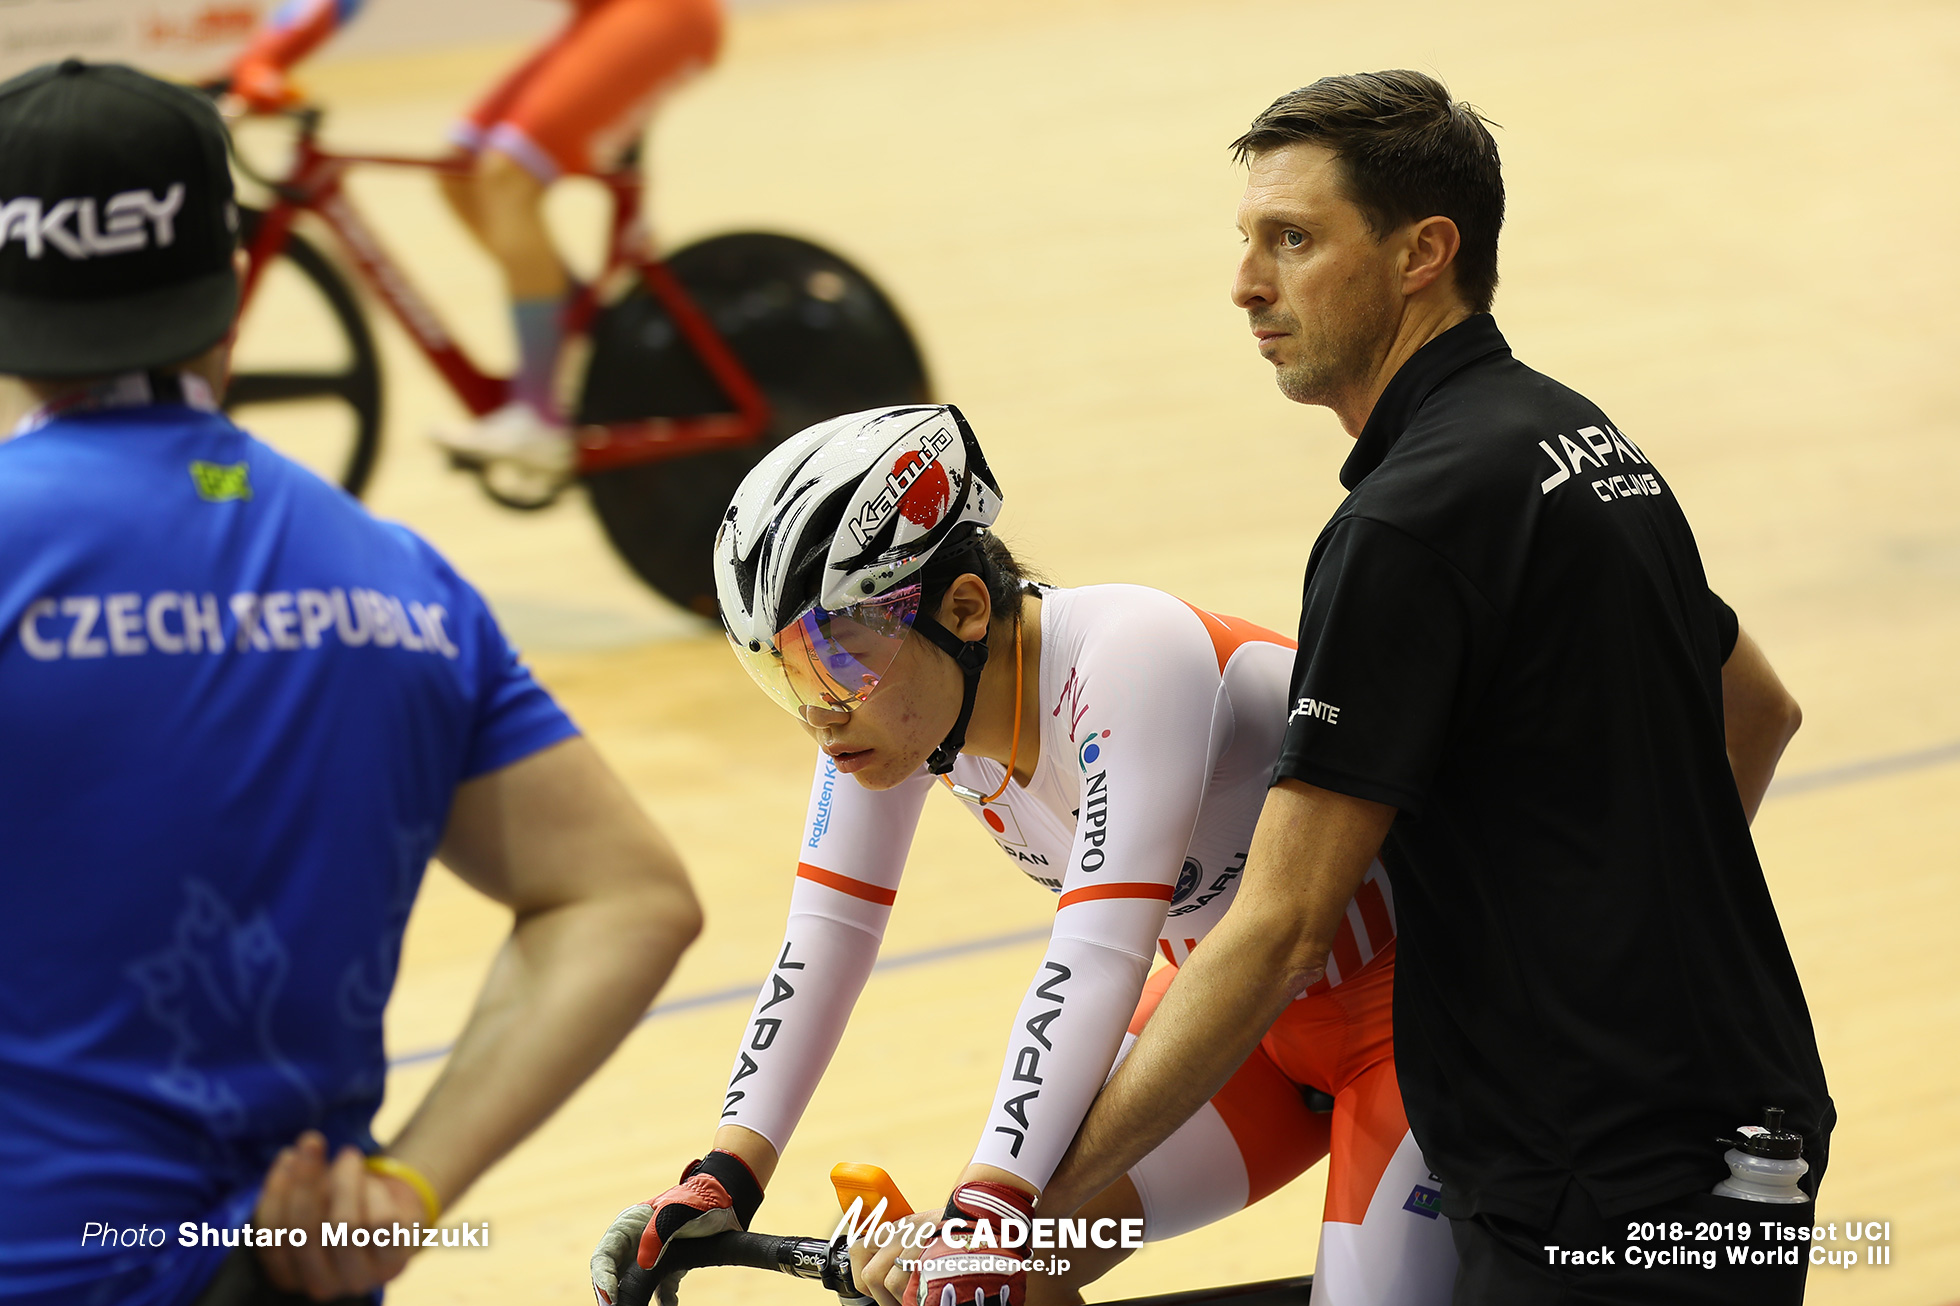 Women's Omnium - Elimination/2018-2019 Track Cycling World Cup III Berlin